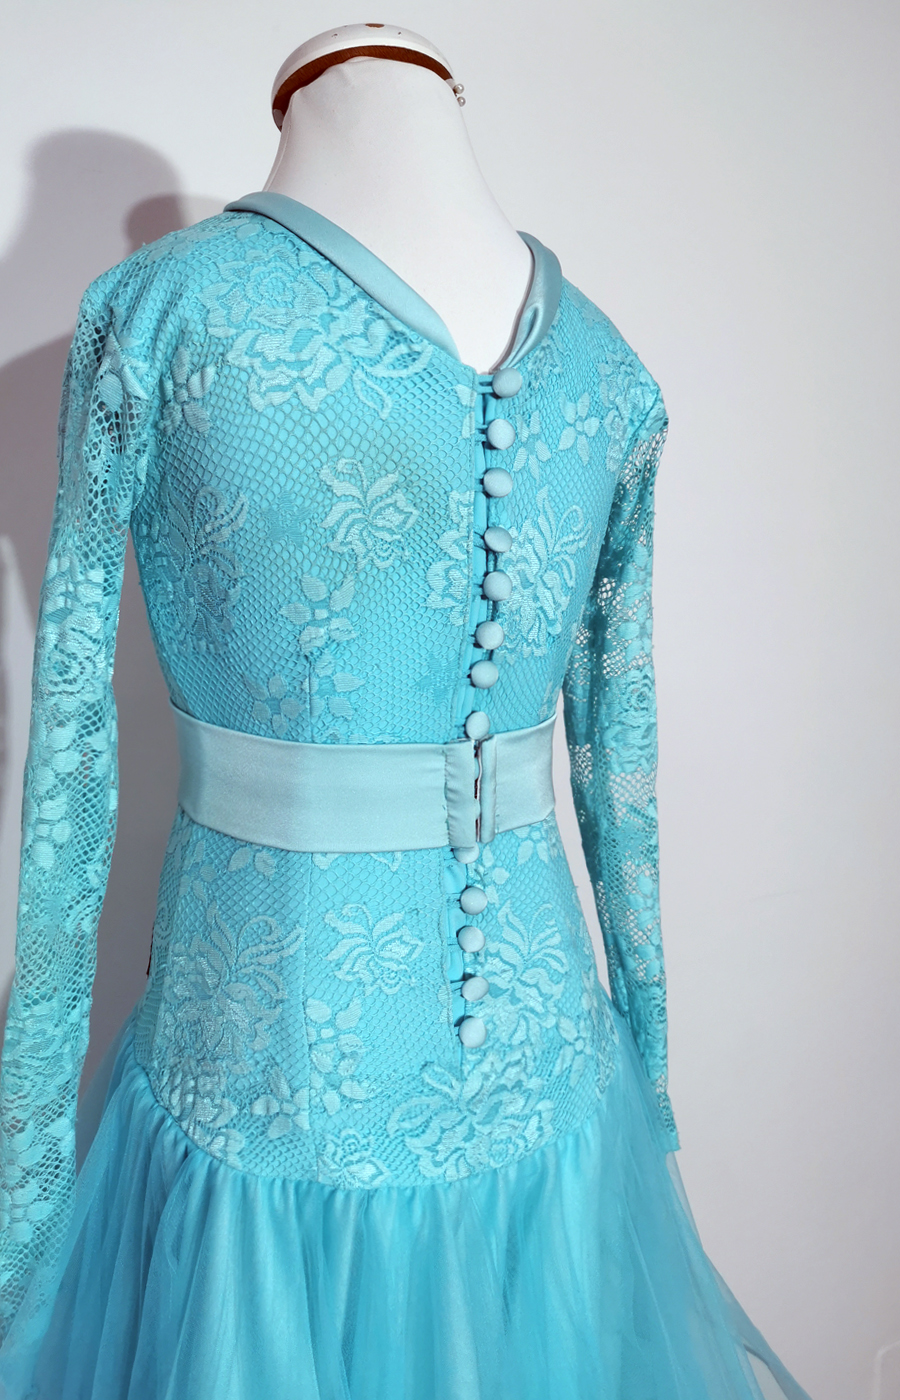 Juvenile Aqua tulle dress